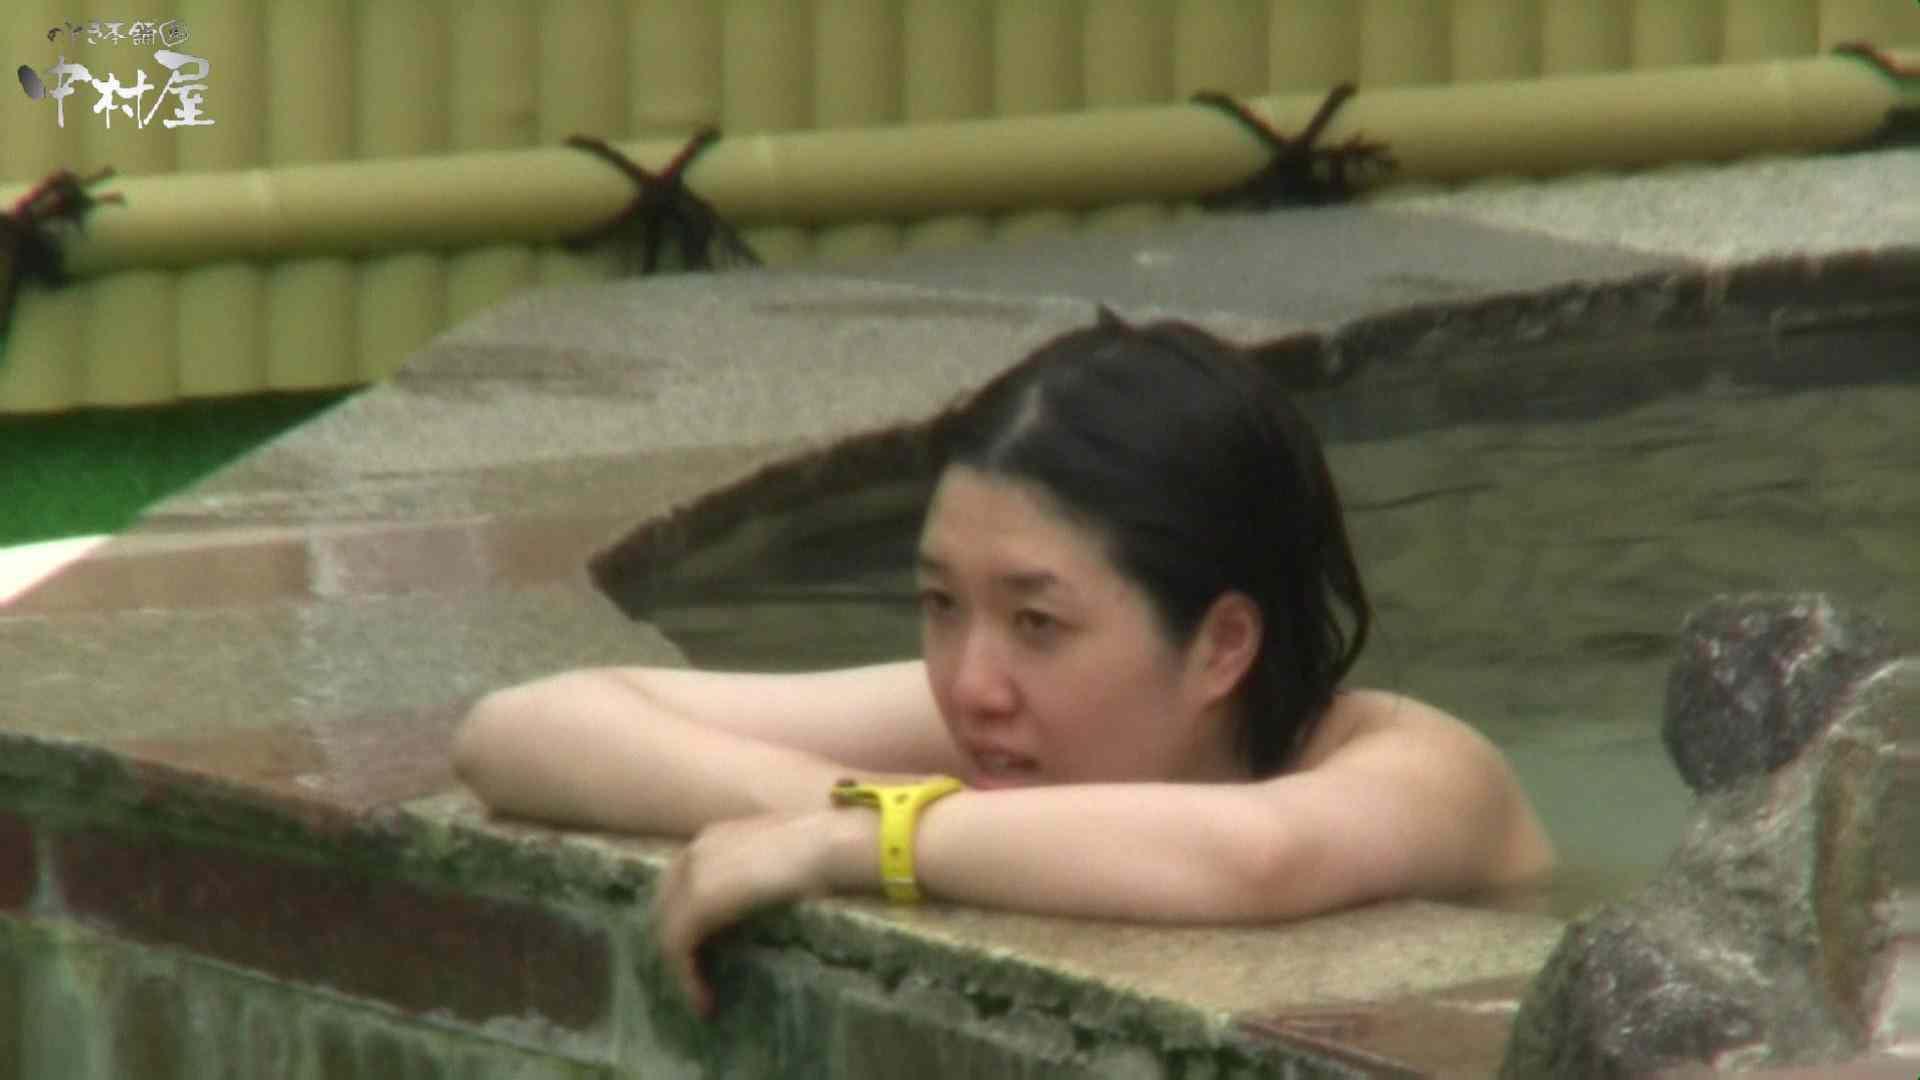 Aquaな露天風呂Vol.946 OLセックス | 盗撮  64画像 16